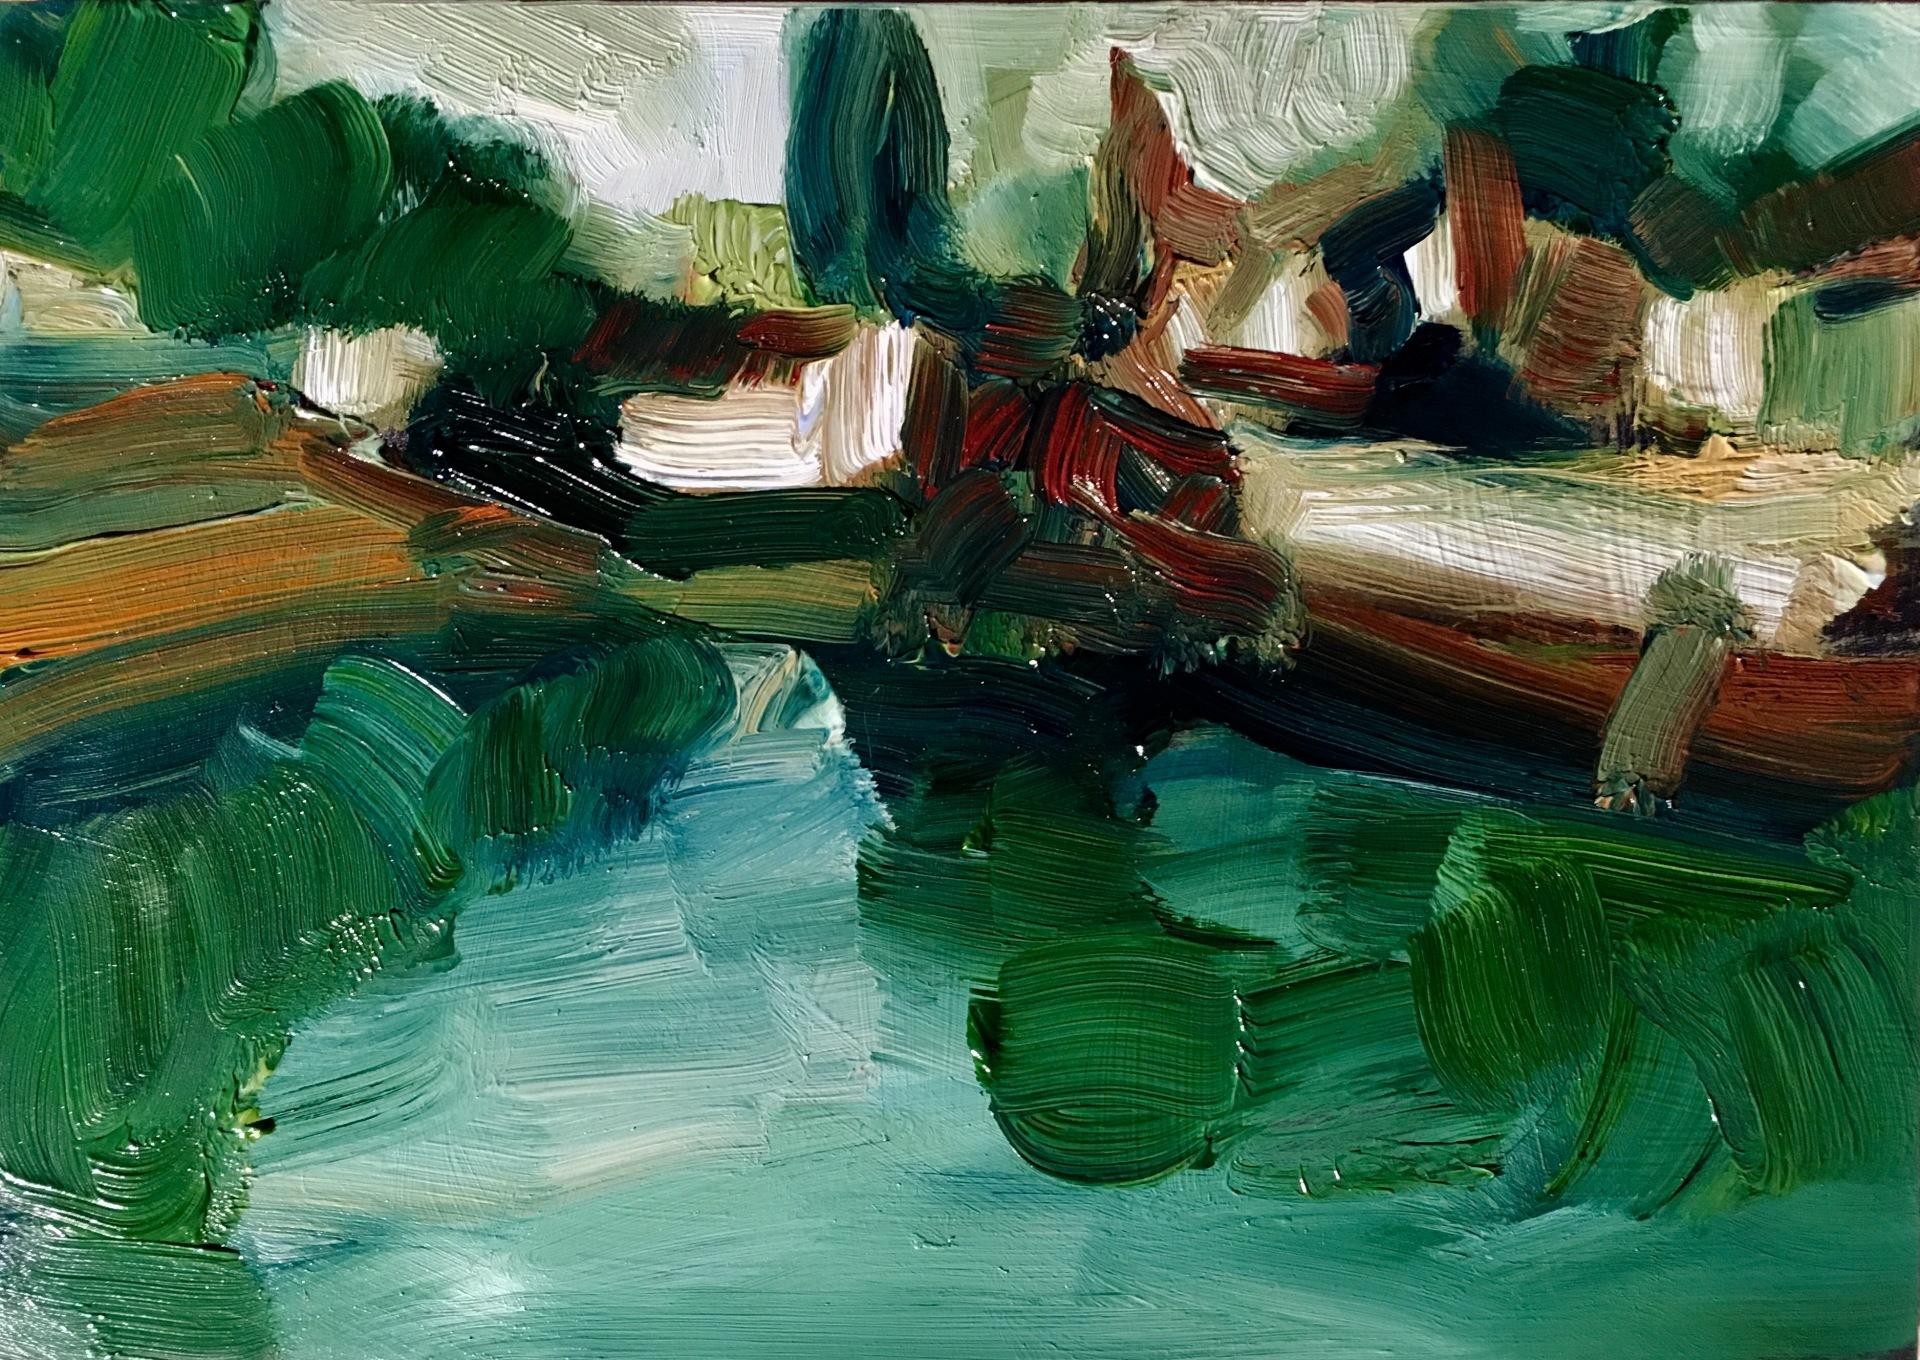 Across the River - Samois sur Seine (SOLD)